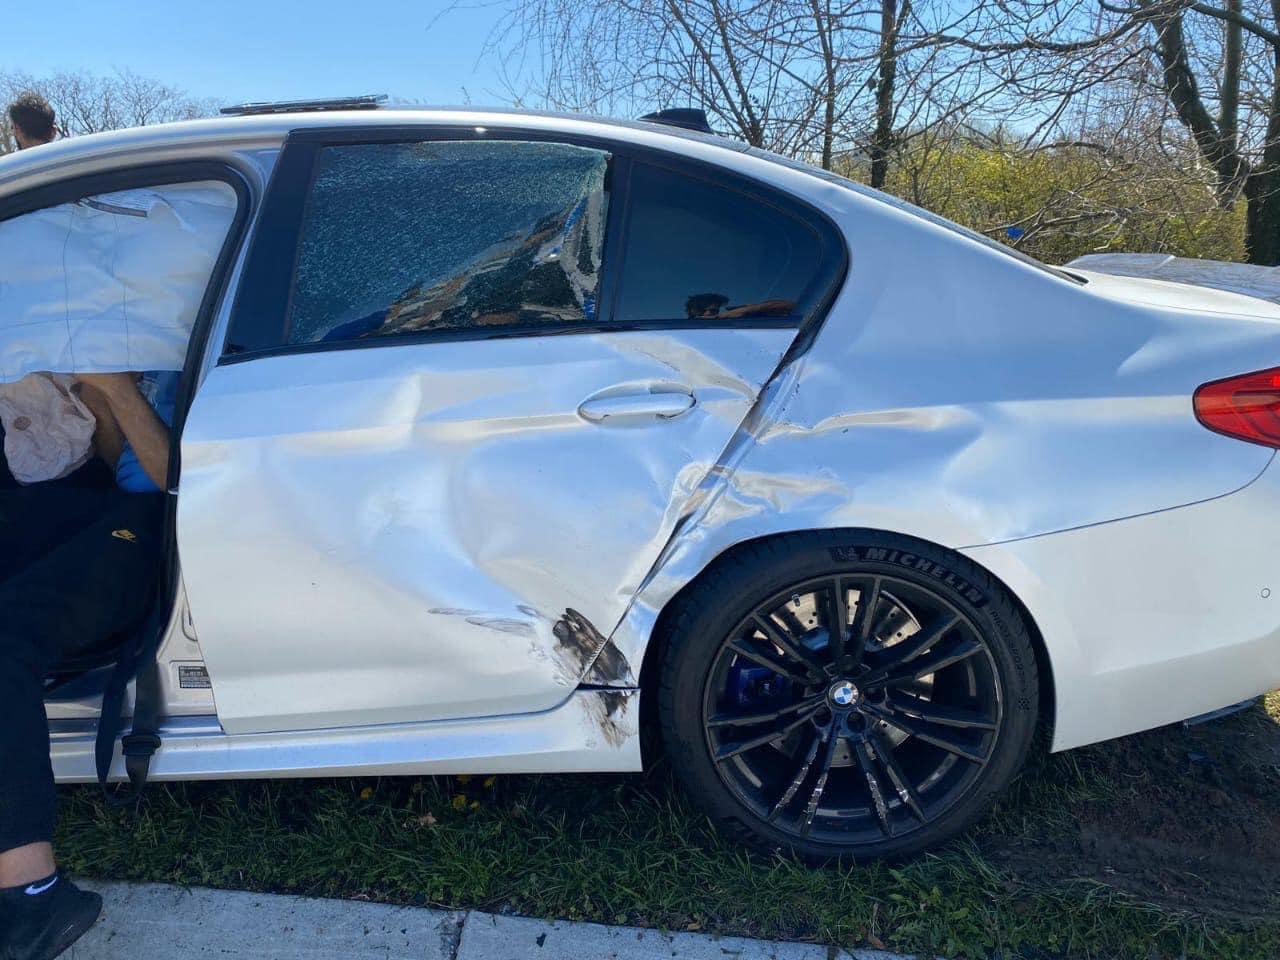 BMW_M5_accident_0004